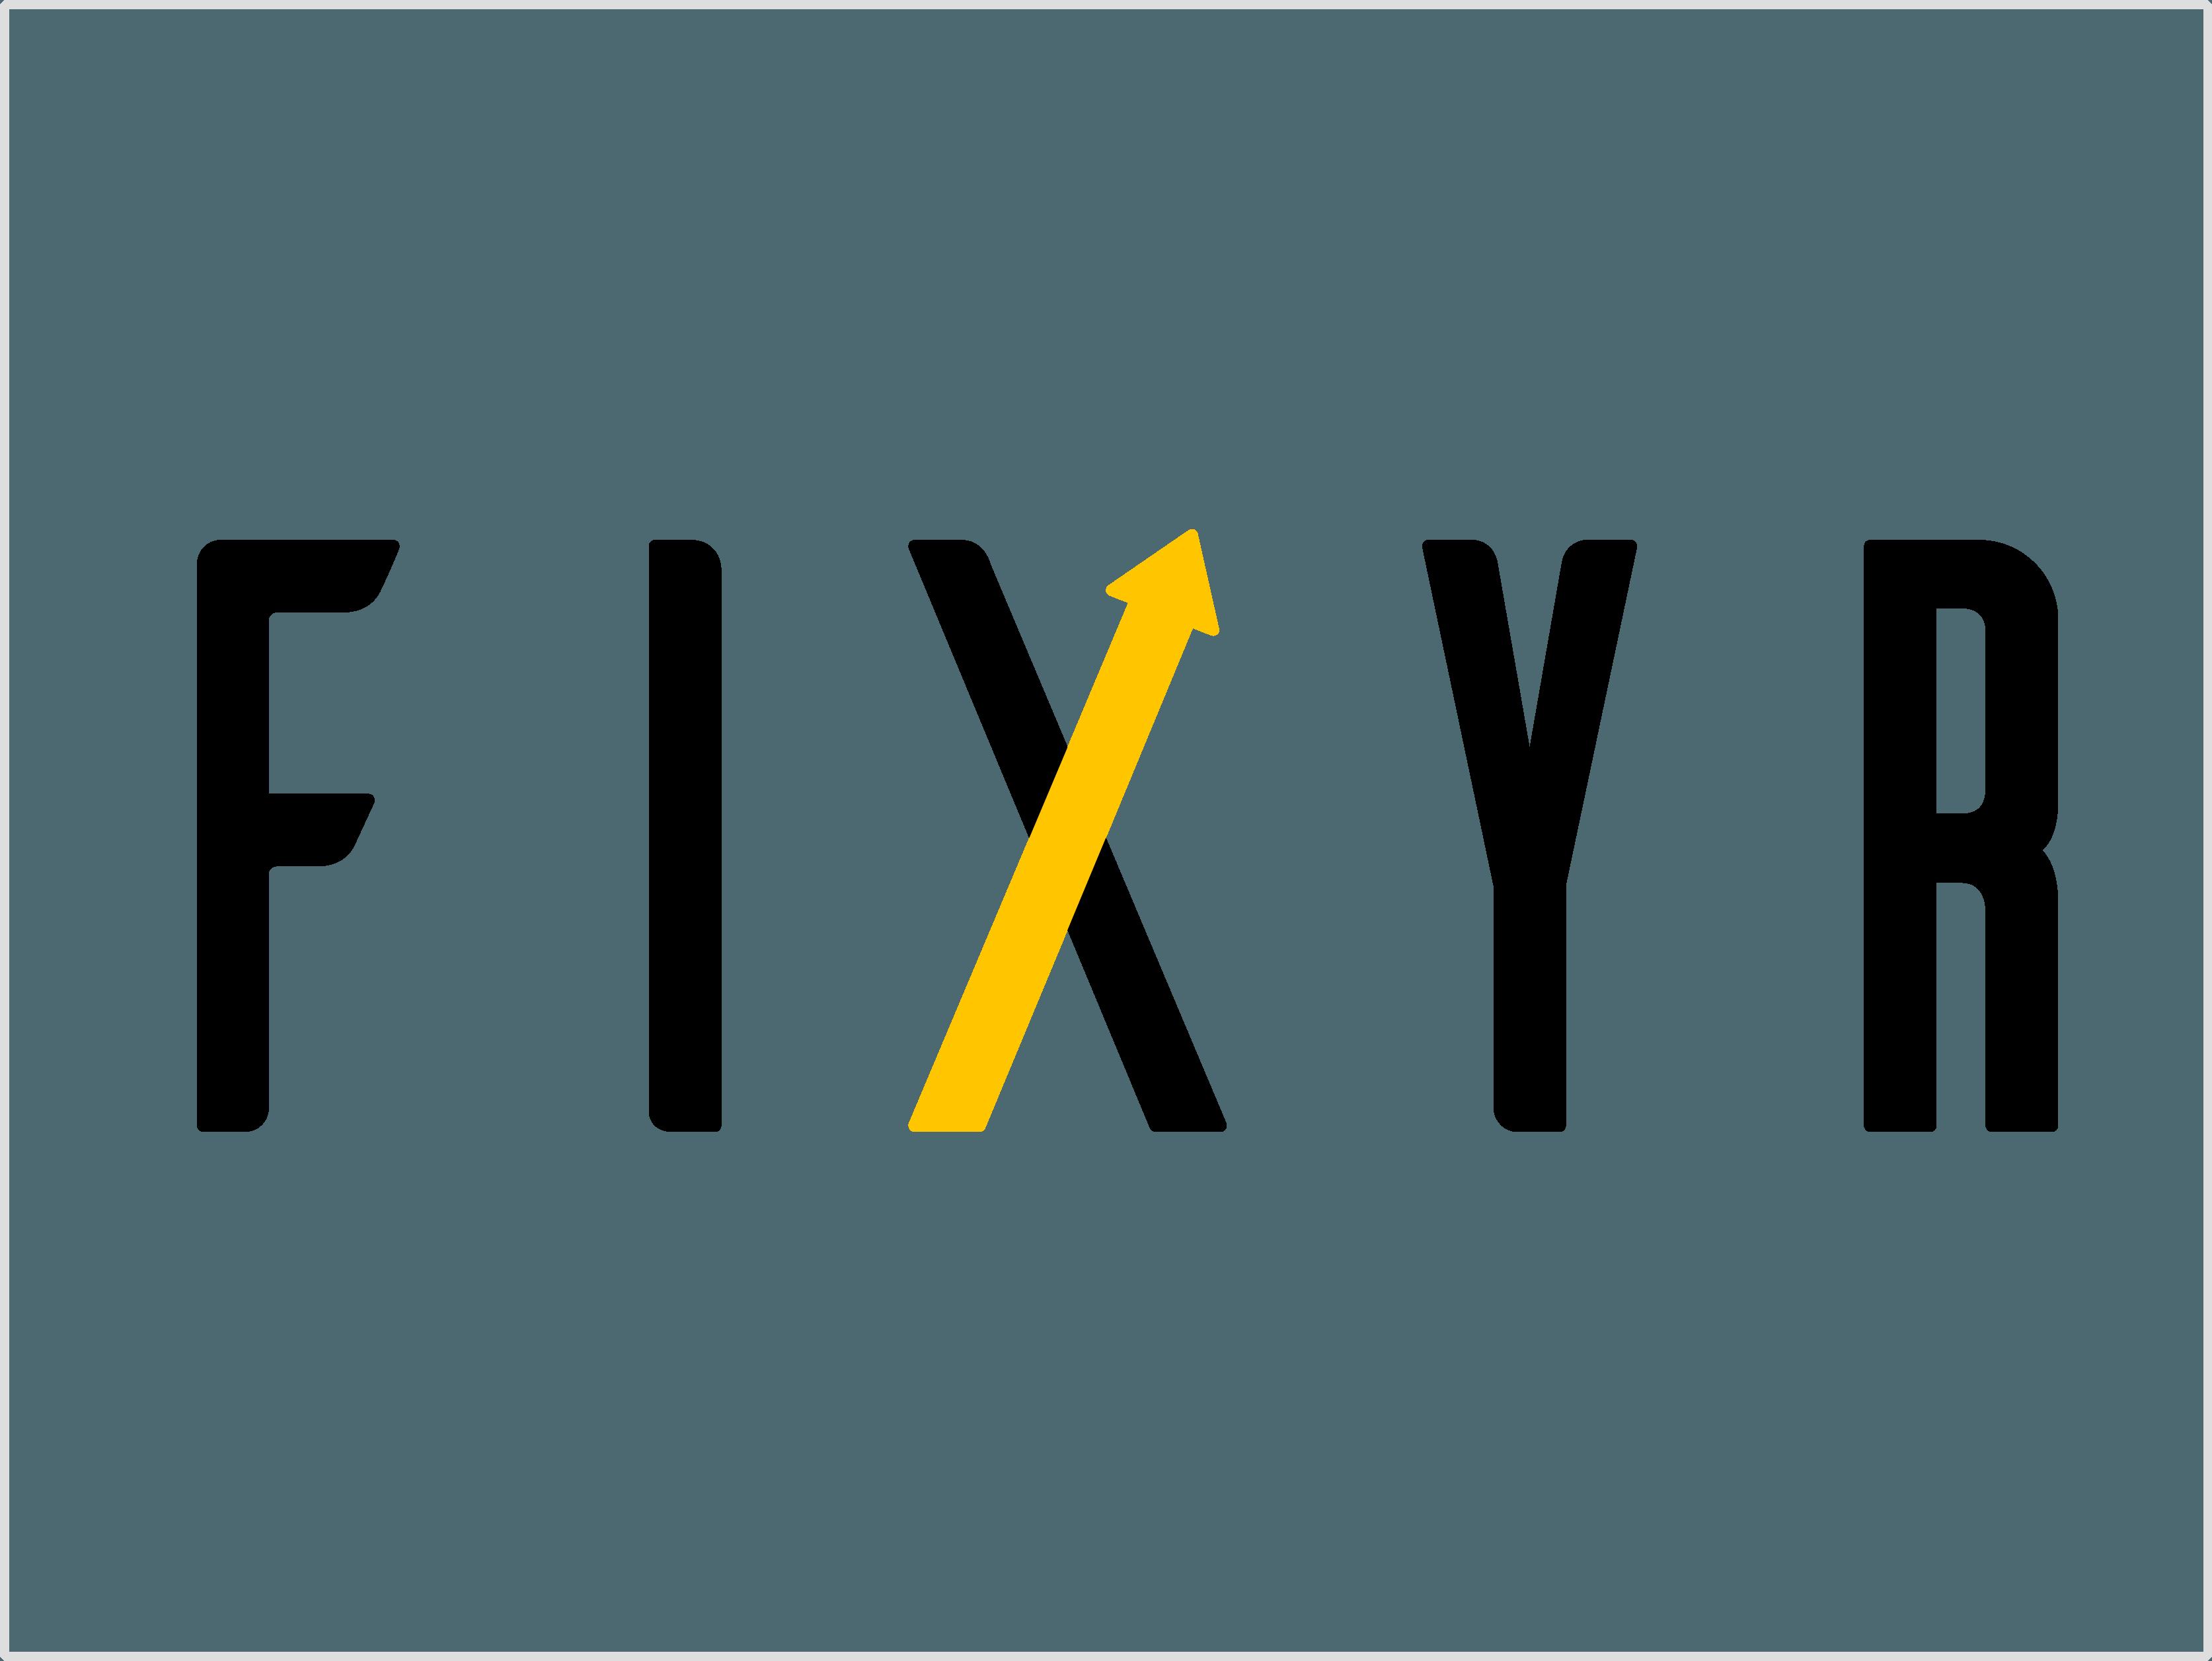 Fixyr